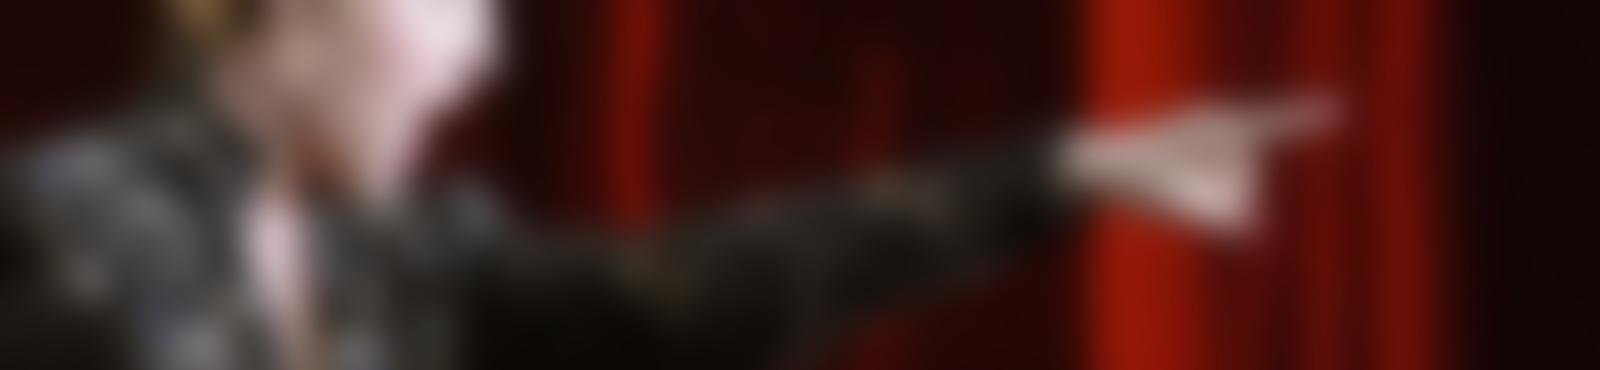 Blurred a50712bf 5325 4116 8f6c 3bfcb70f465b